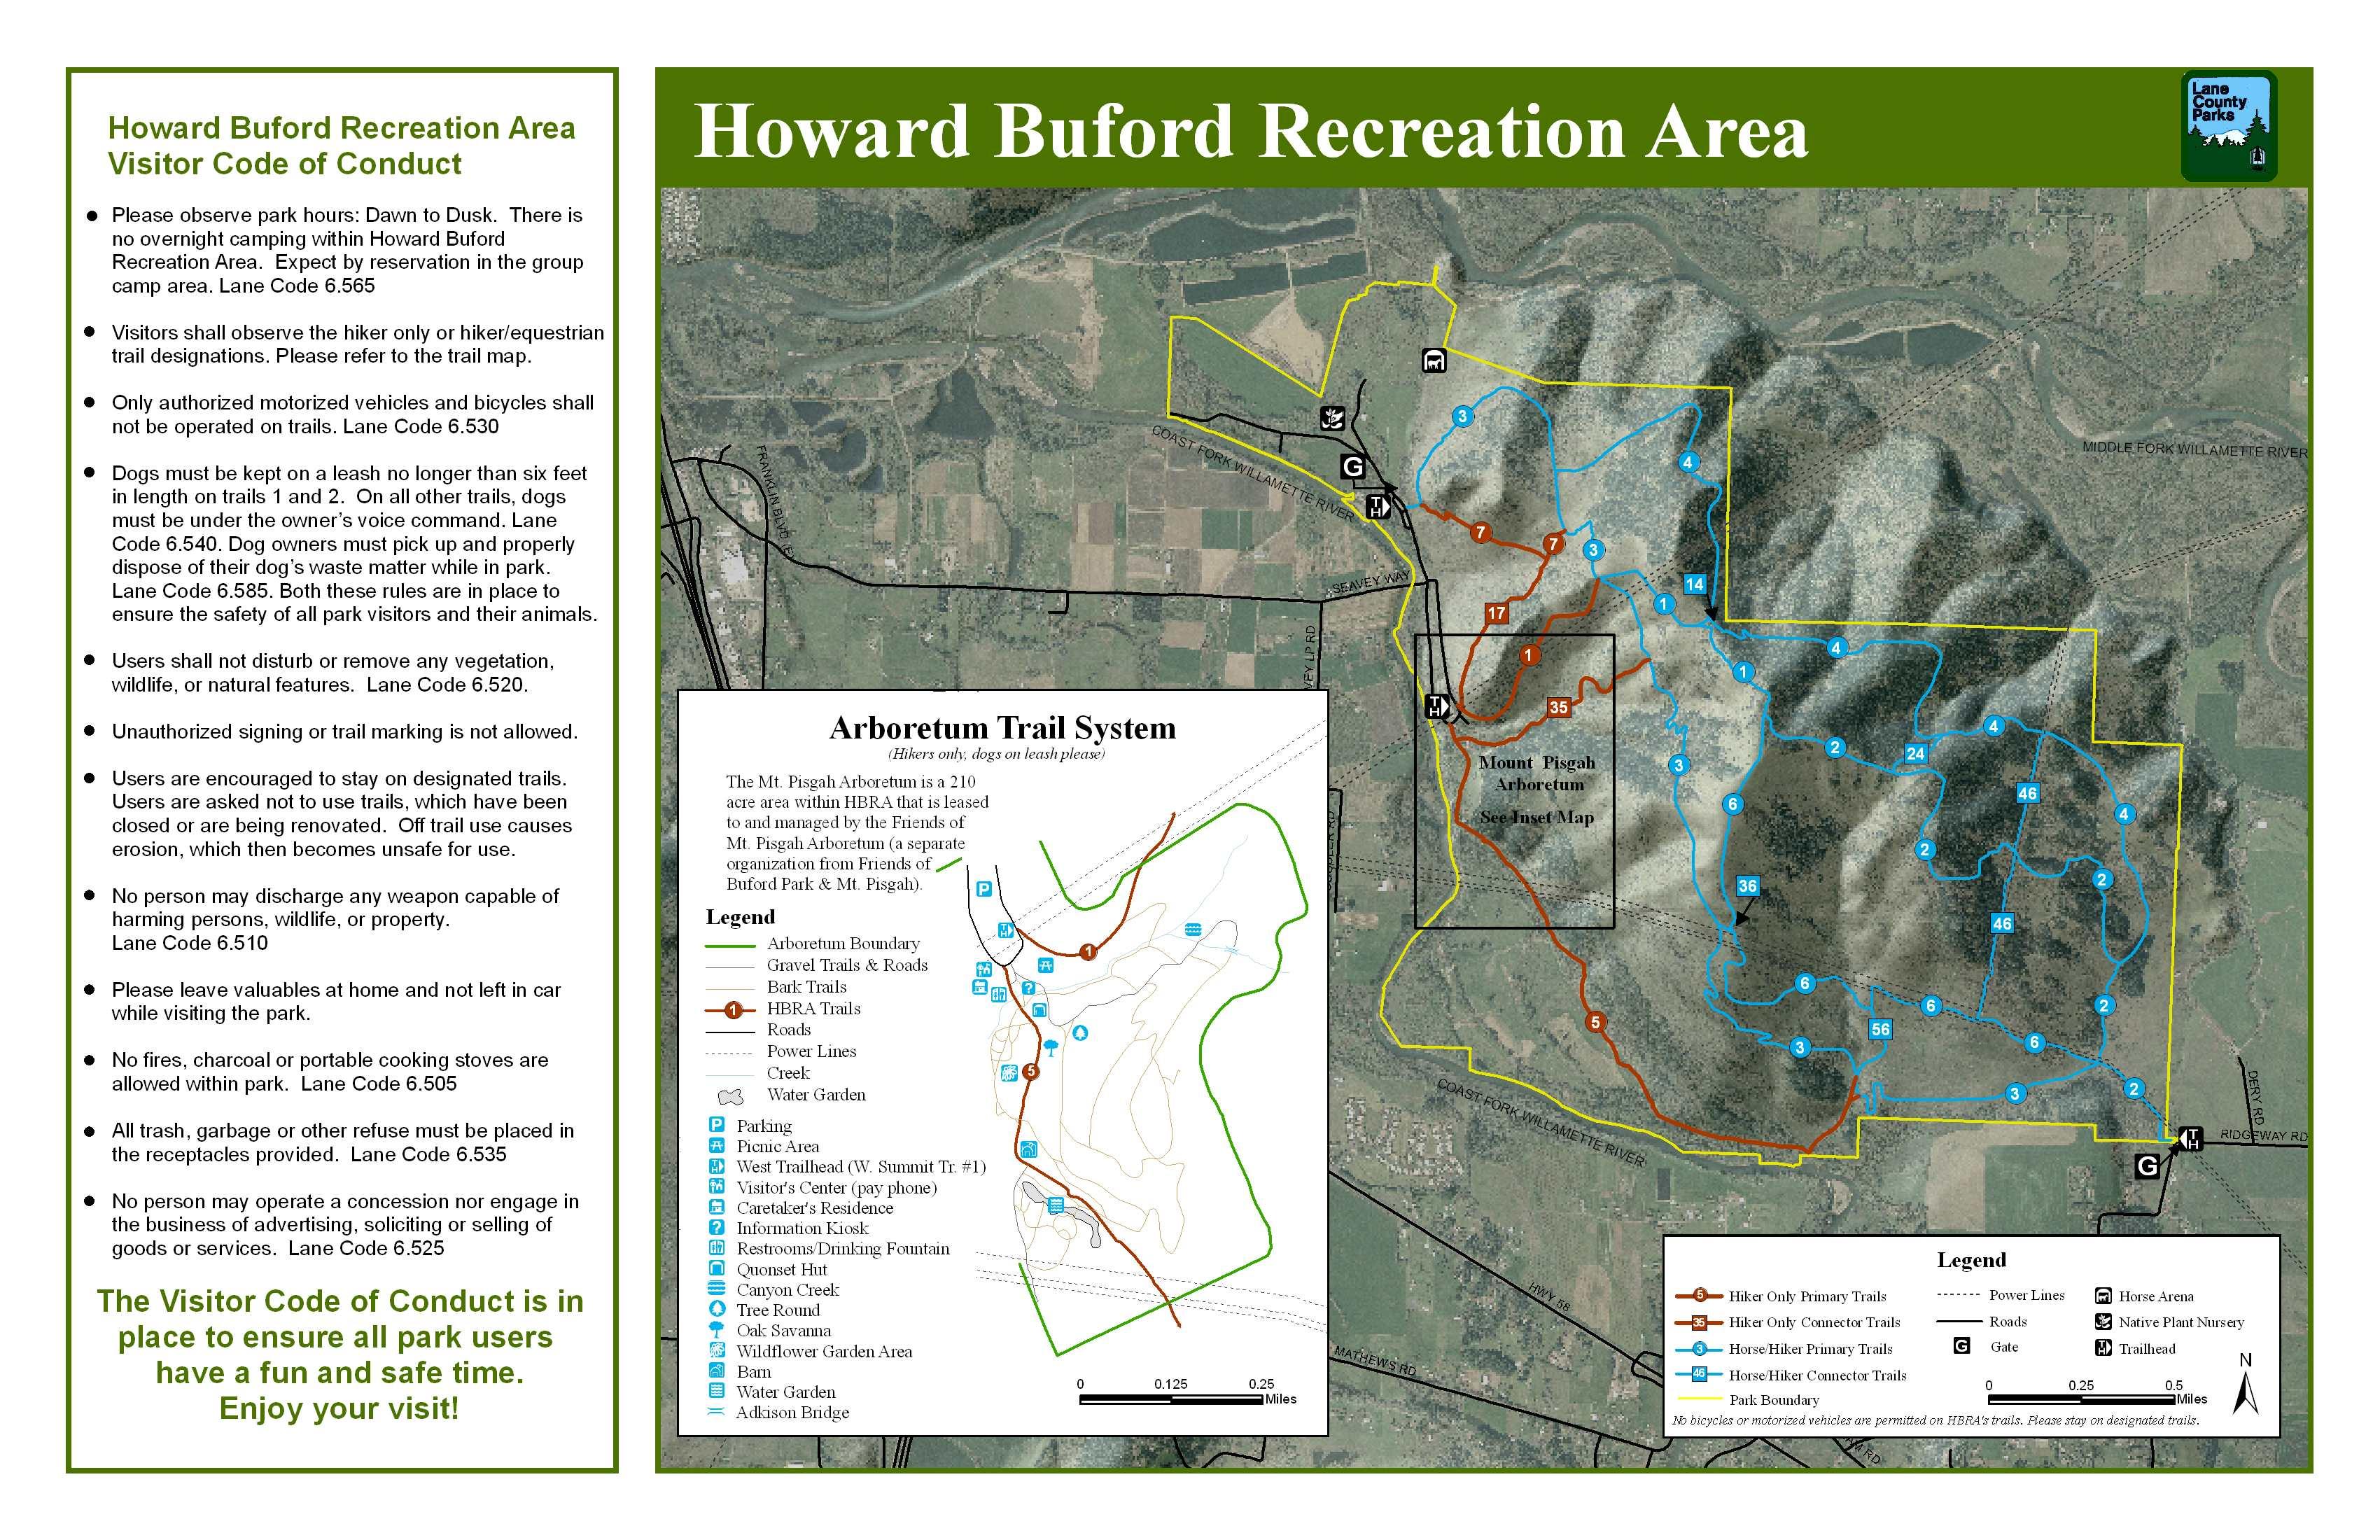 Howard Buford Recreational Area Trails Map Eugene Oregon USA mappery